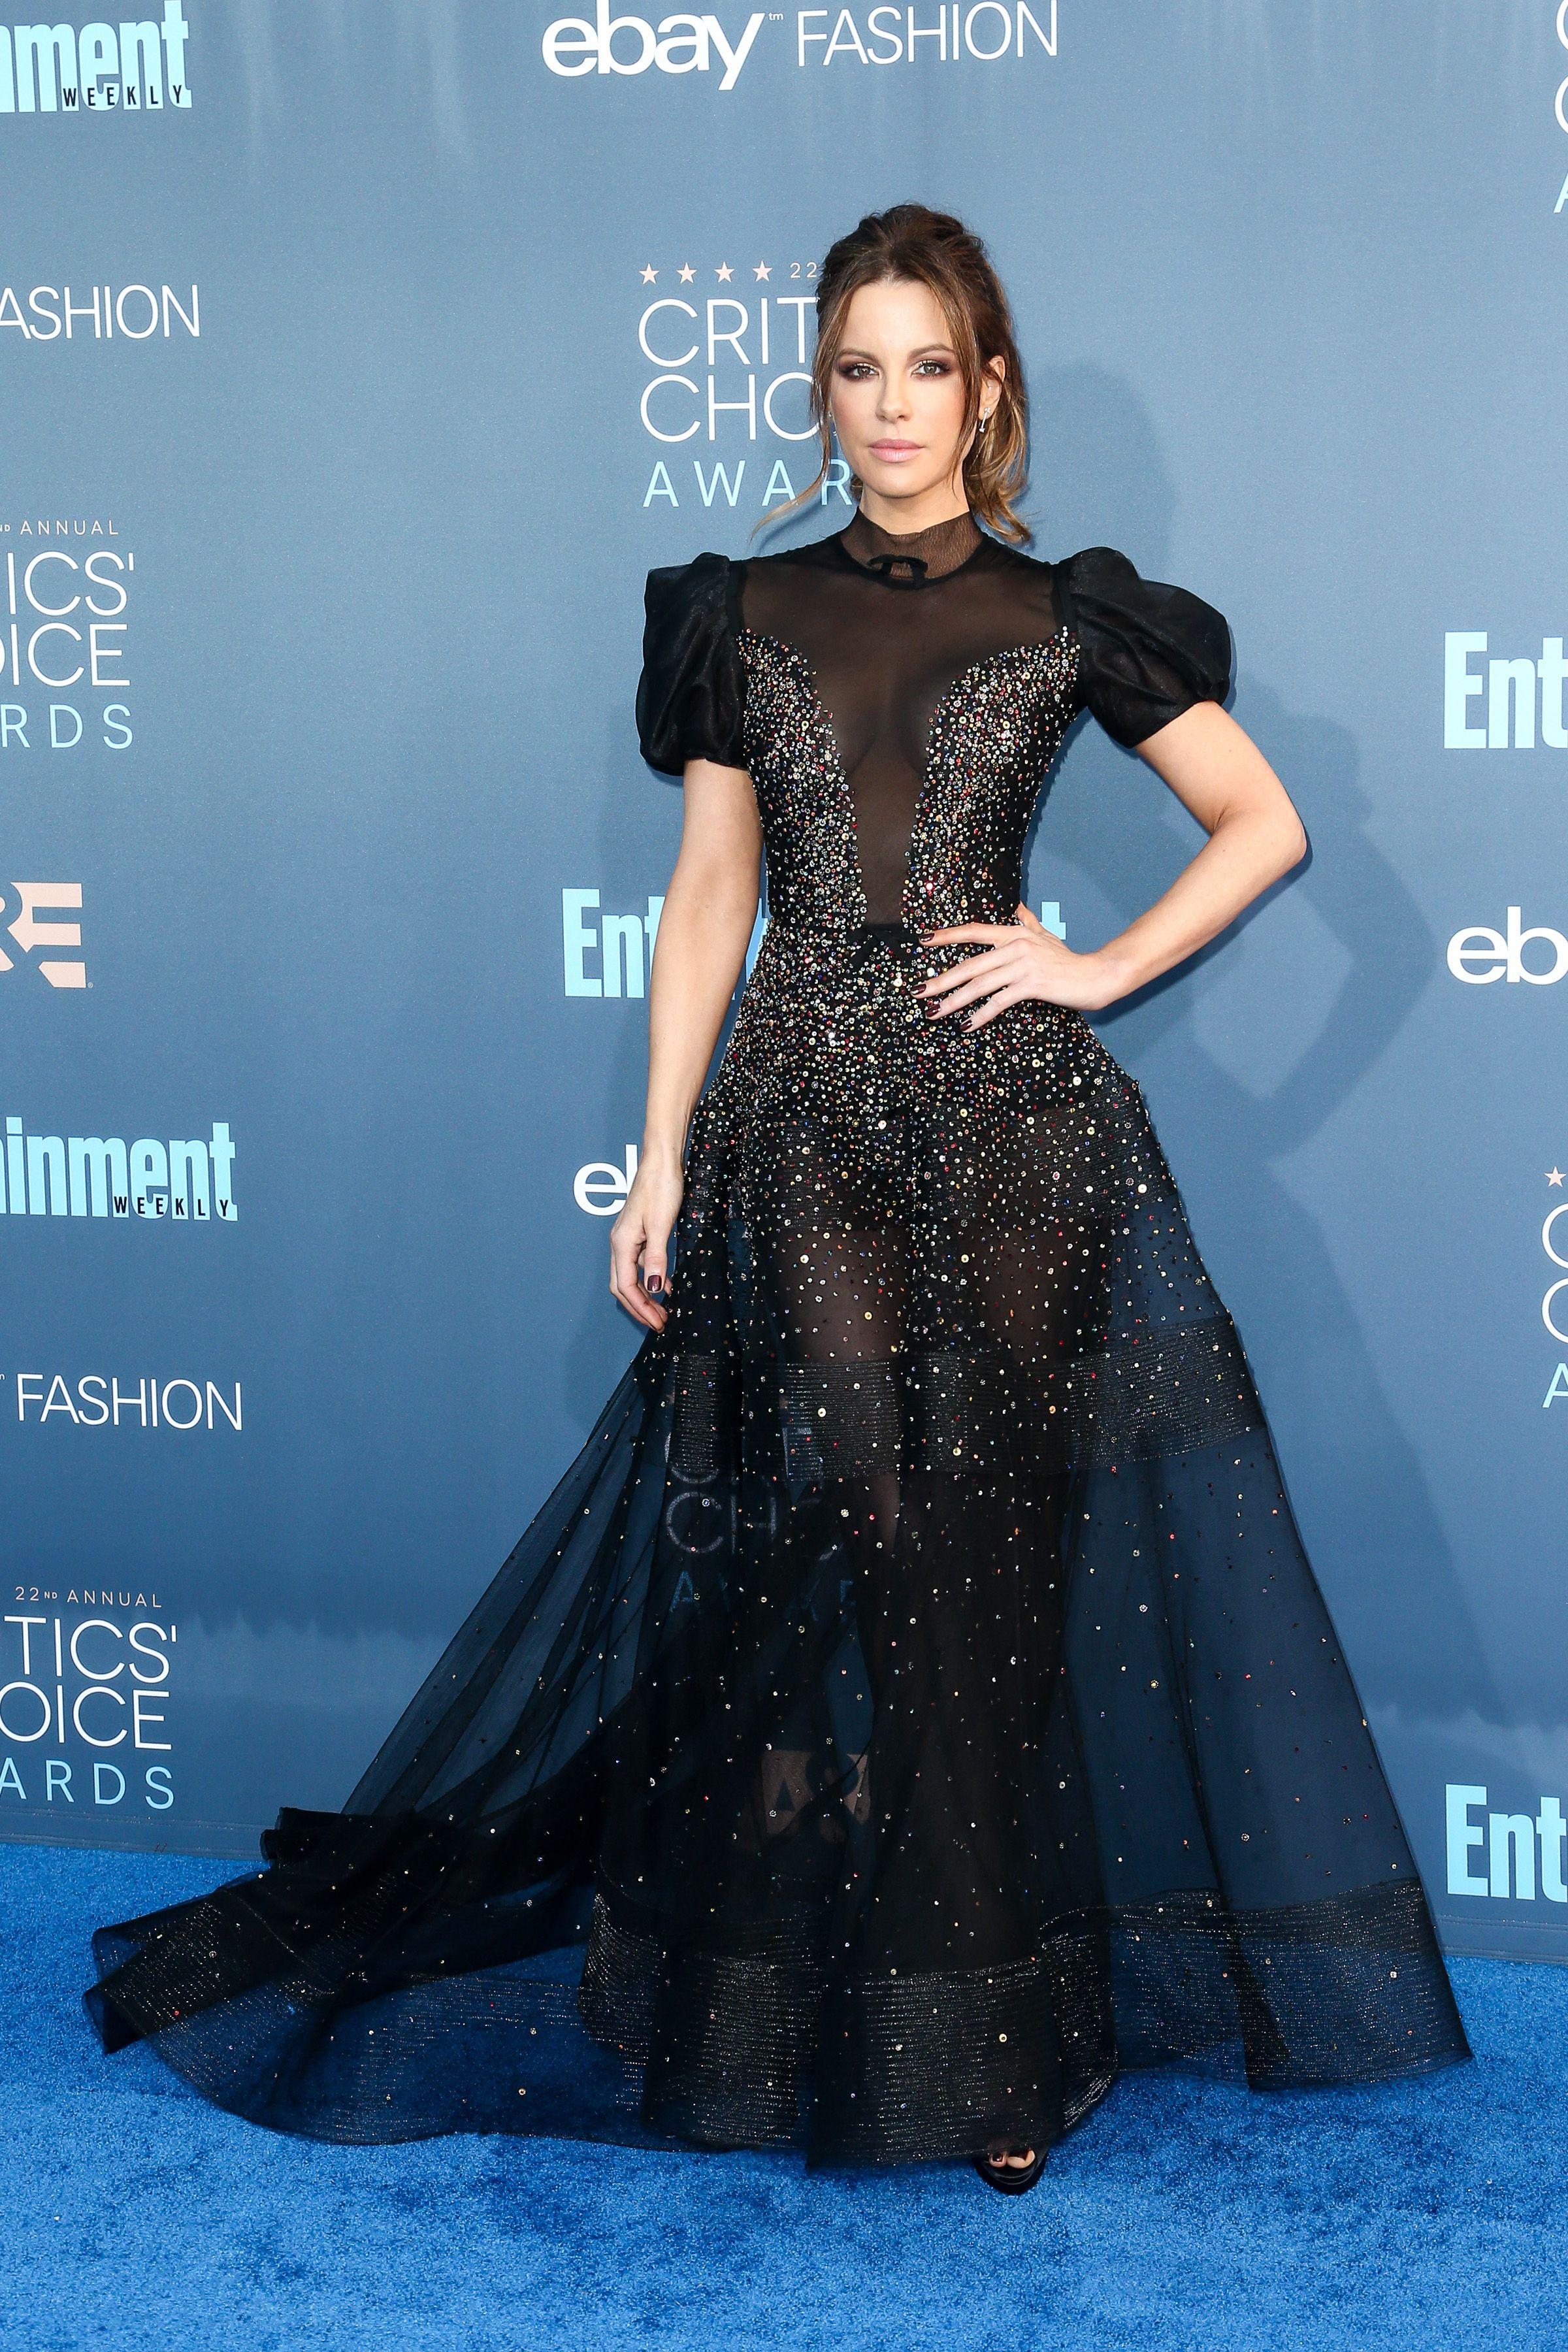 Kate Beckinsale at the 22nd Annual Critics' Choice Awards. Photo by John Salangsang/BFA/REX/Shutterstock